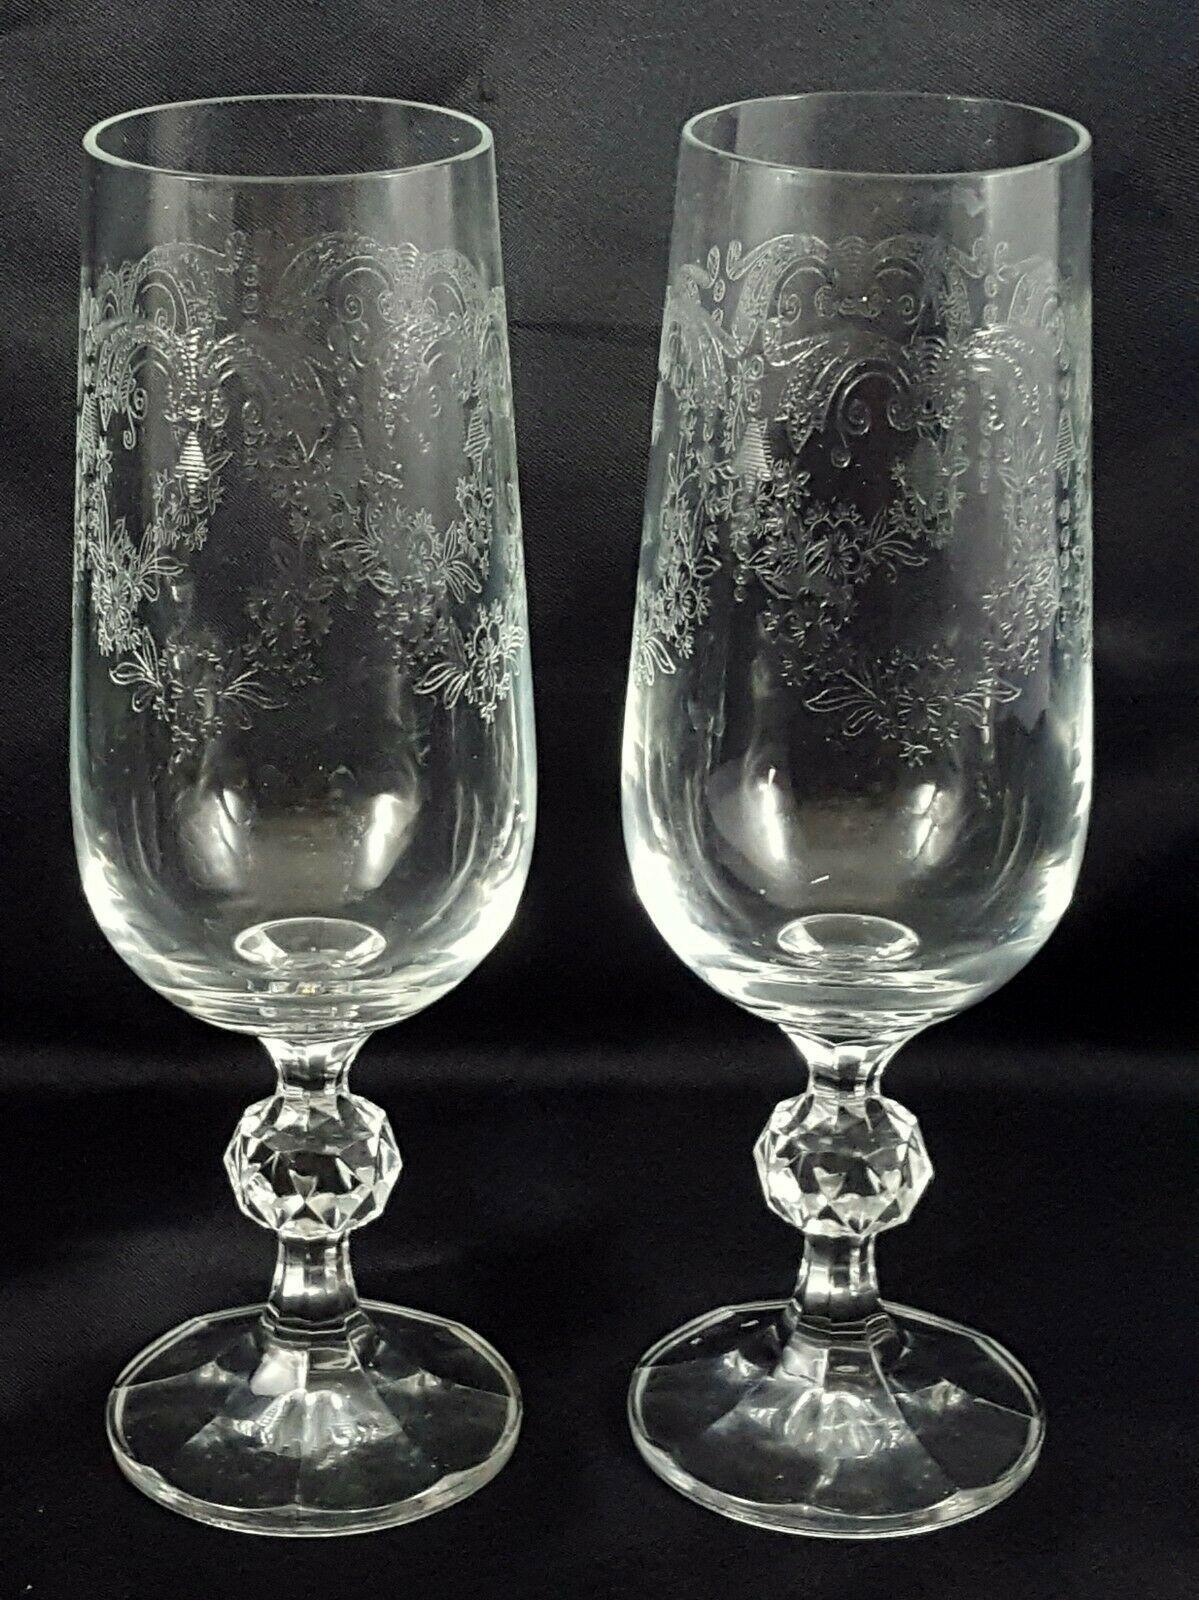 Crystalex Import Assoc Cascade Champagne Flutes Set of 2 Czech Crystal 6 oz